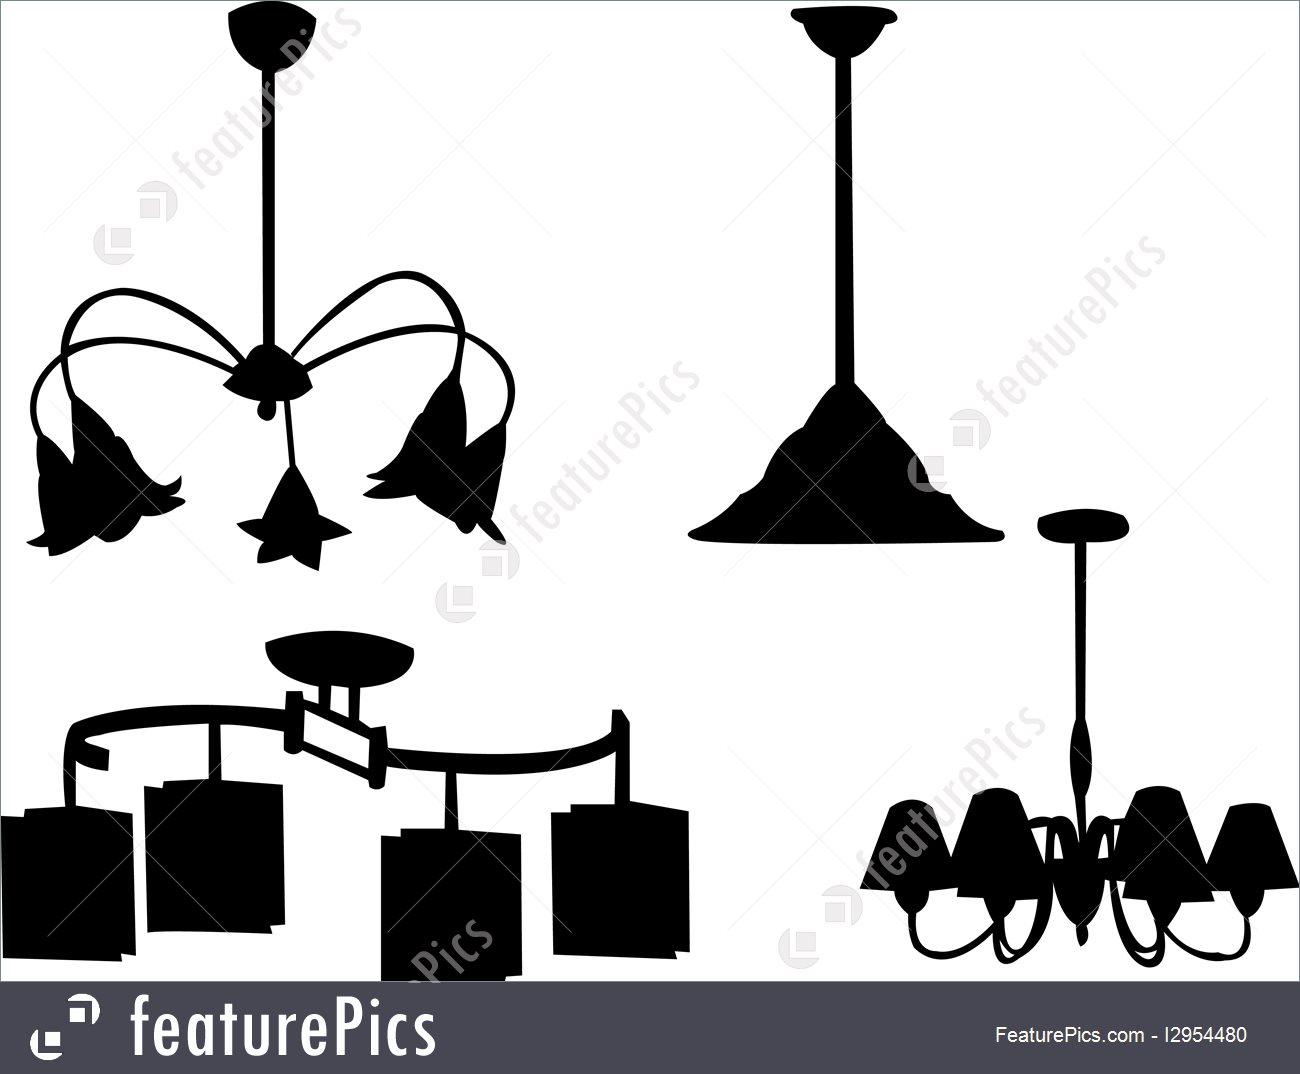 1300x1074 Chandelier Silhouette Illustration